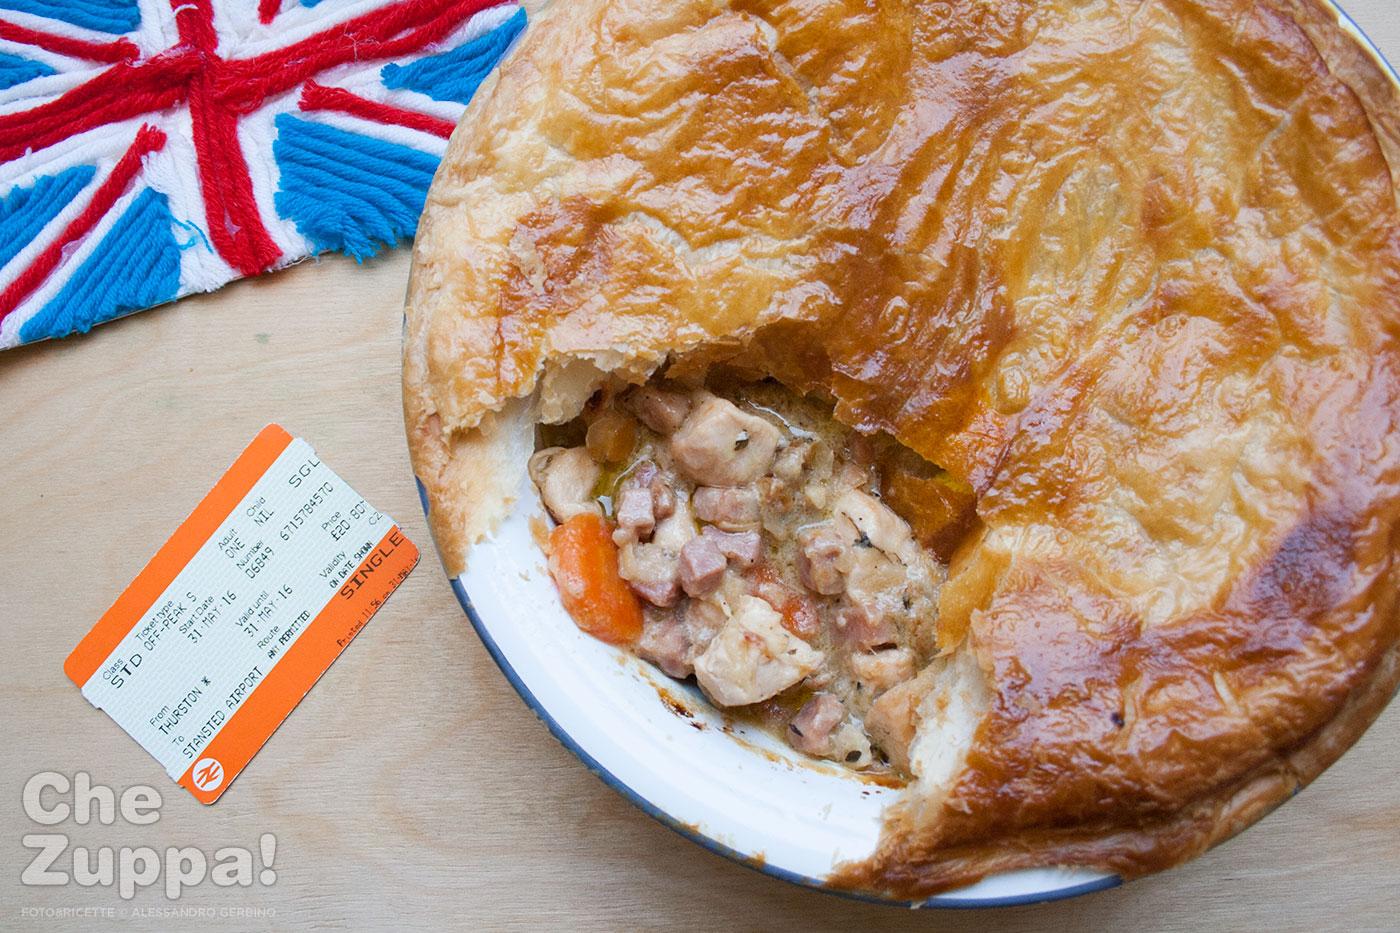 Cucina inglese Archivi | Chezuppa!Chezuppa!